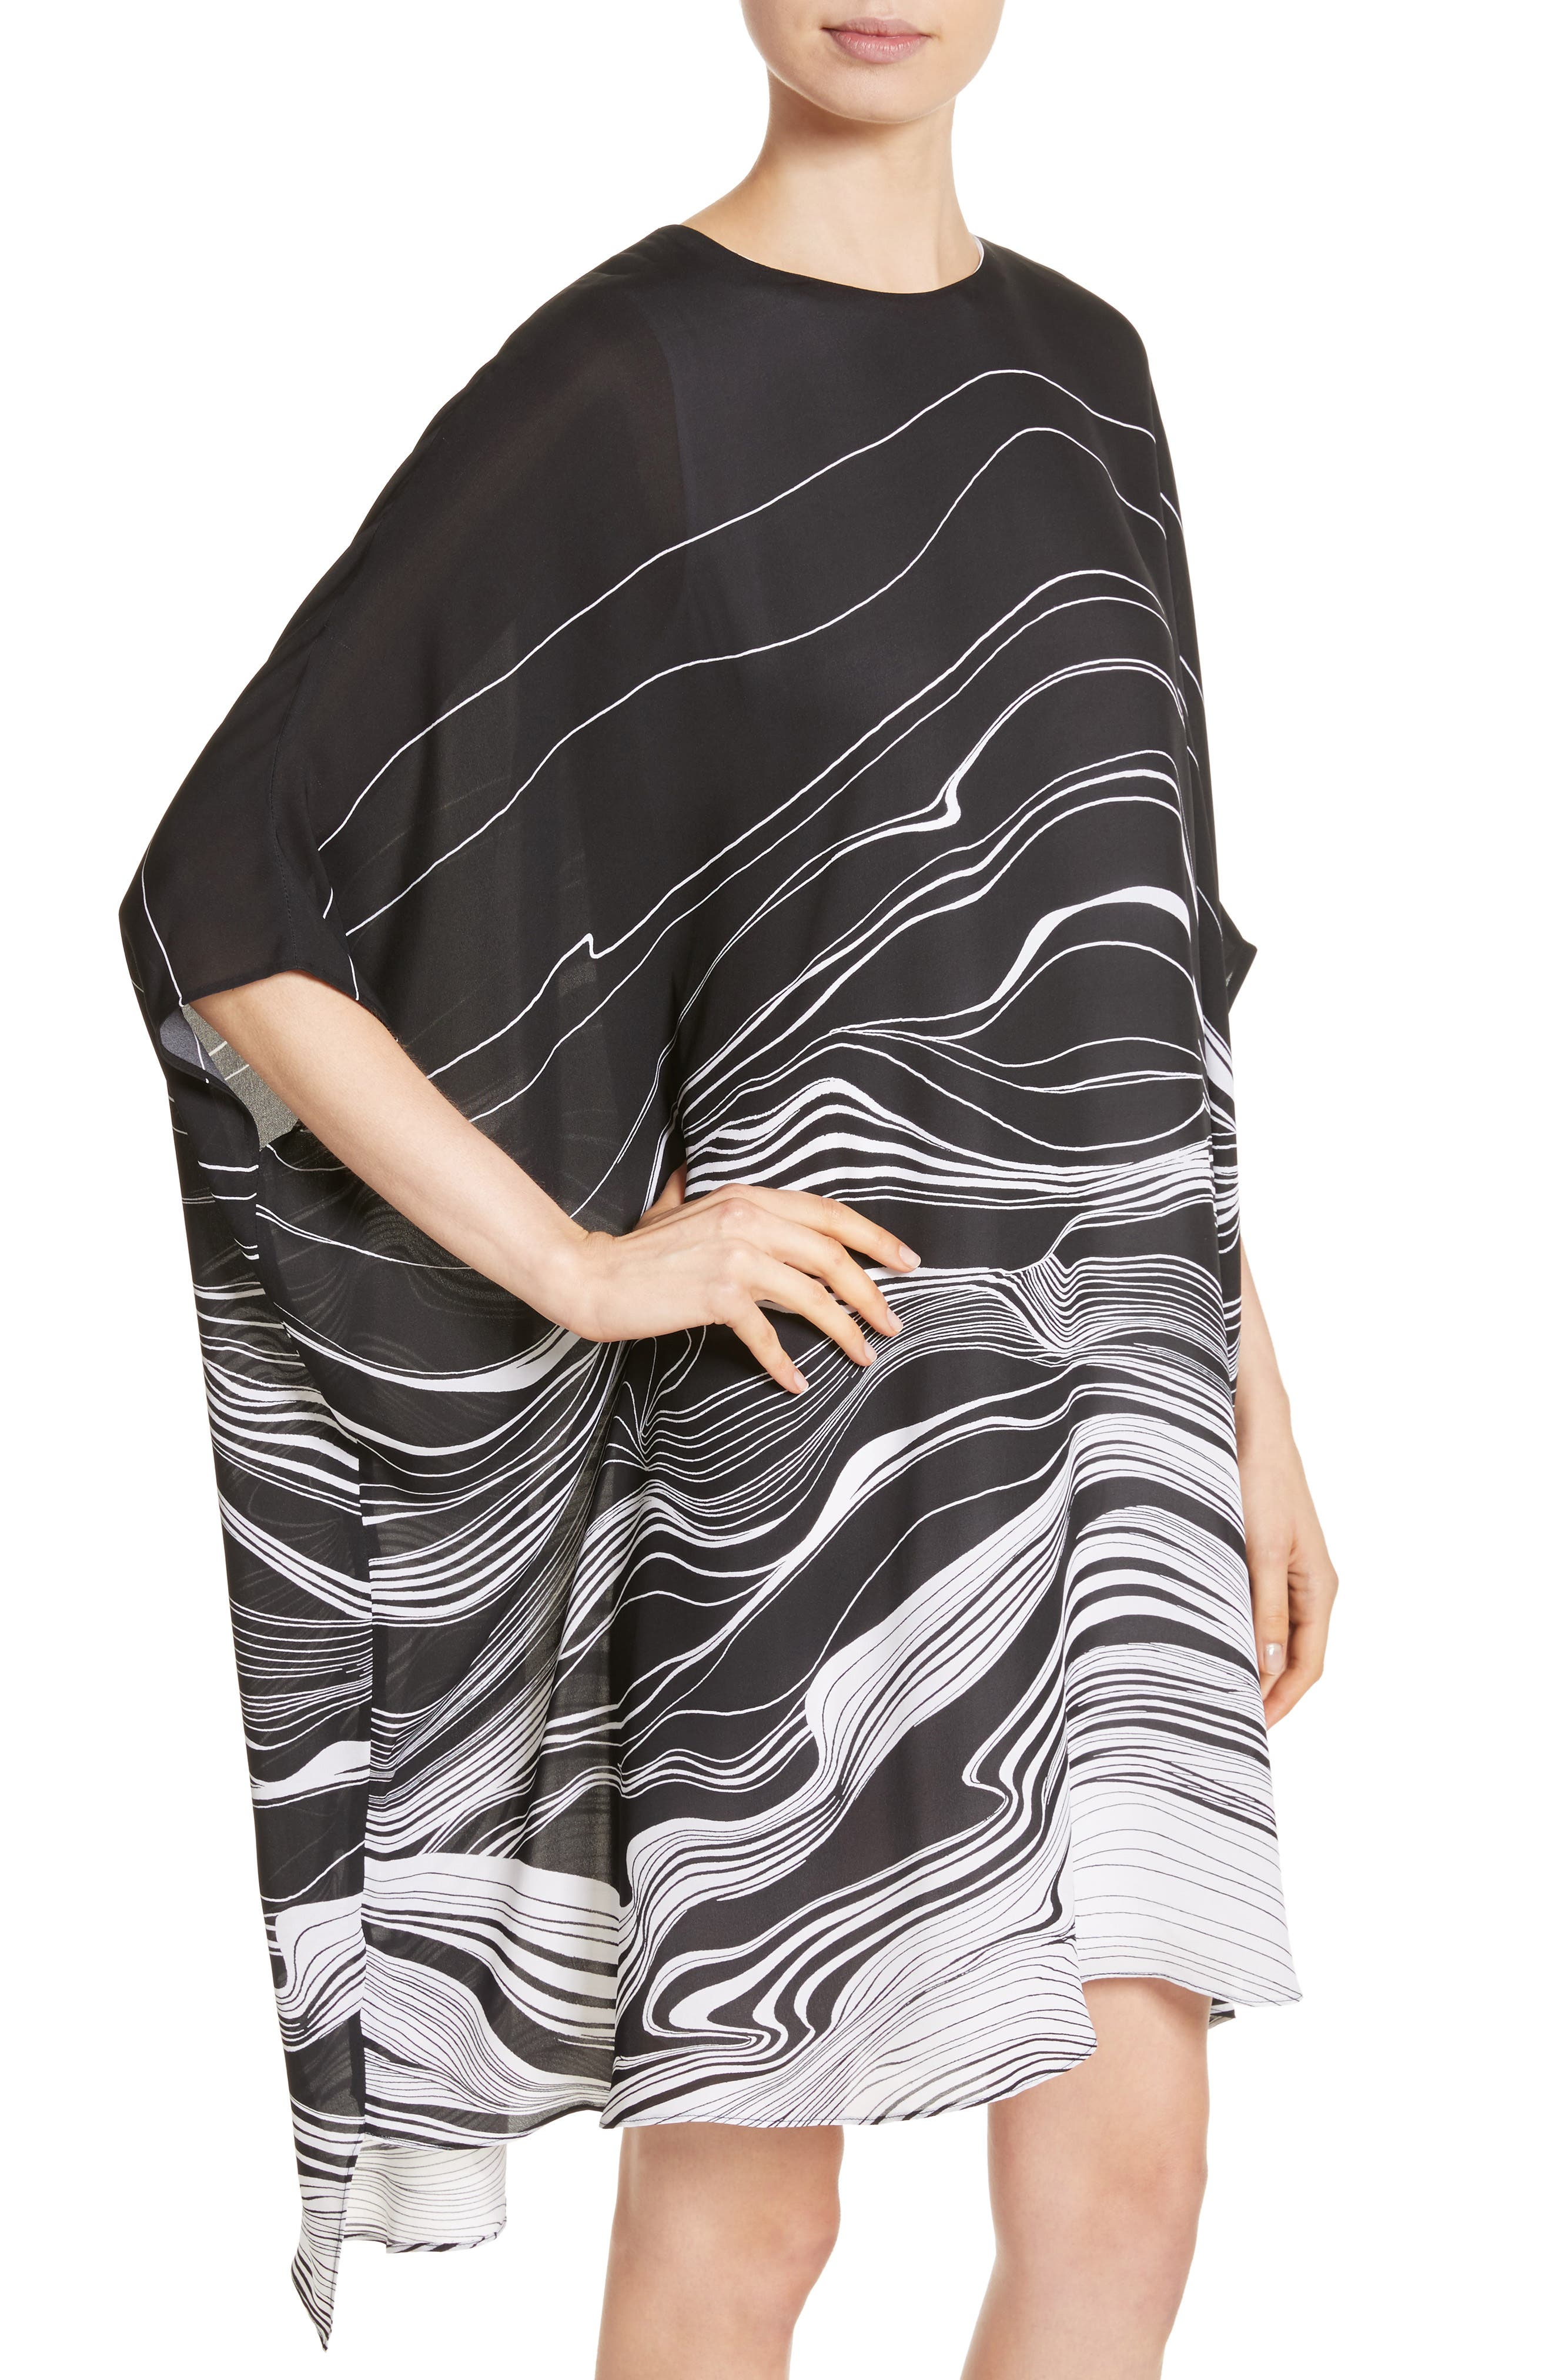 Brushstroke Print Silk Satin Dress,                             Alternate thumbnail 4, color,                             001